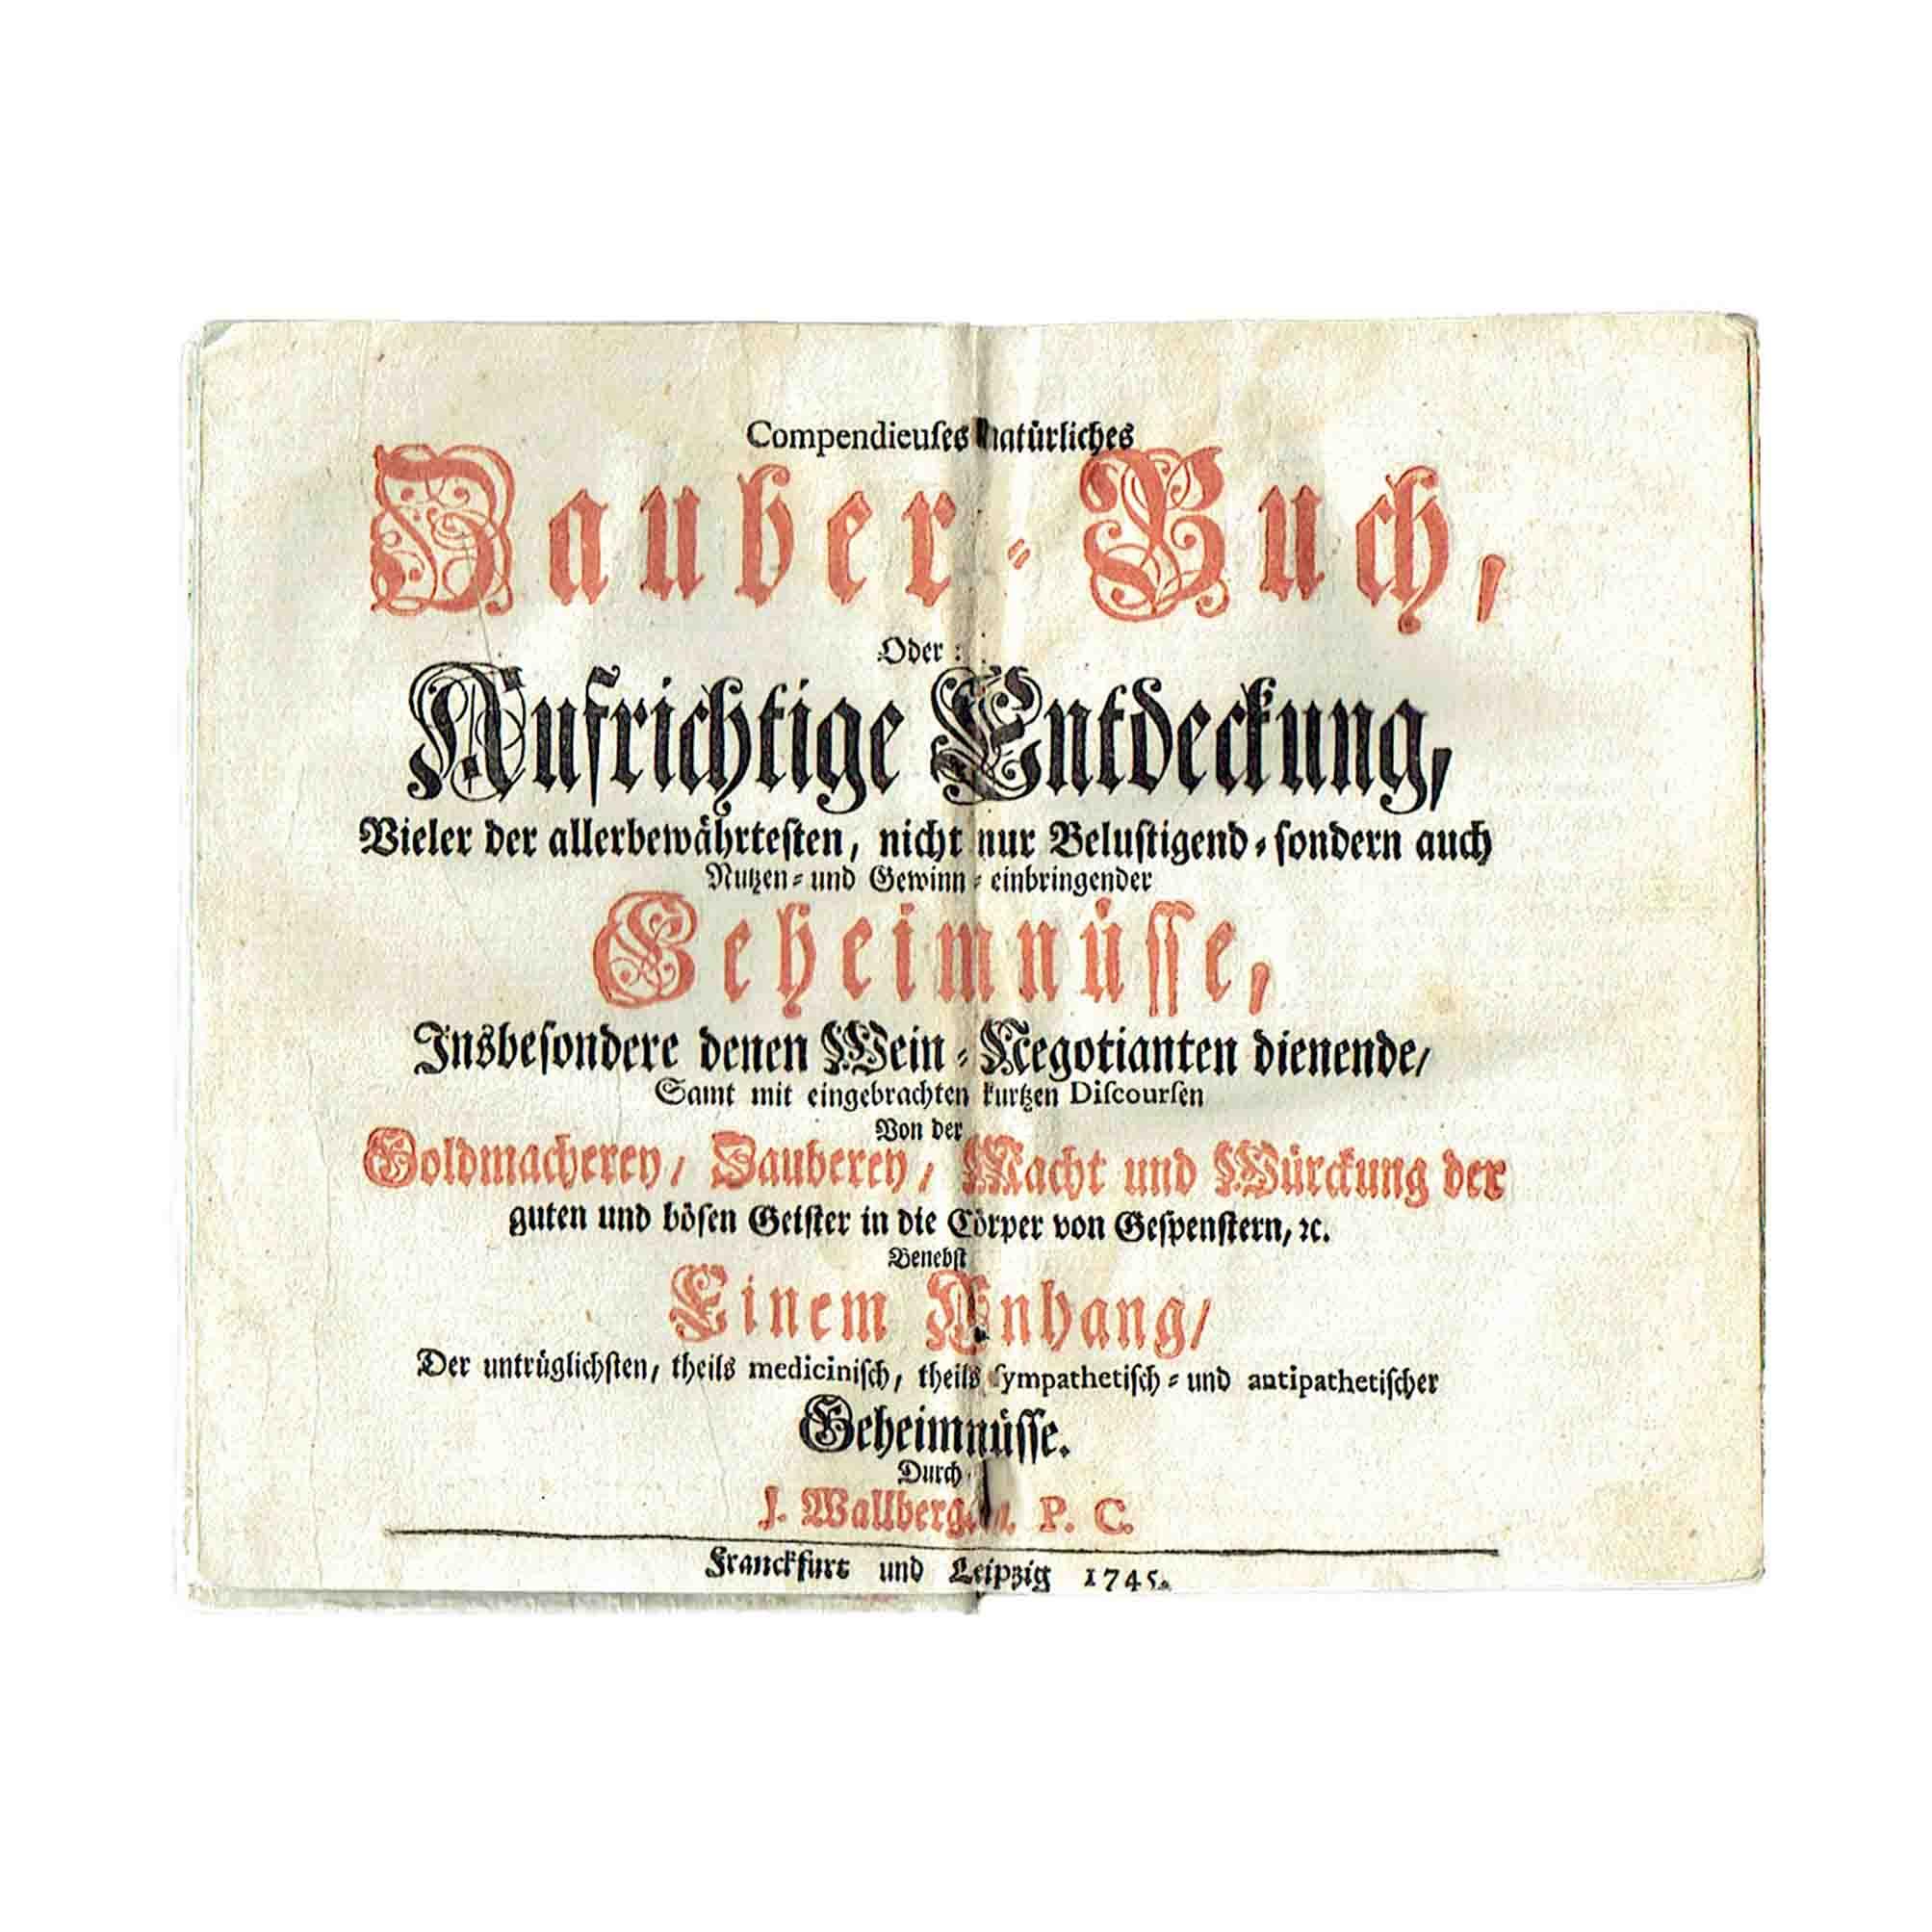 5958-Wallberg-Zauber-Buch-1745-Title-A-N.jpg